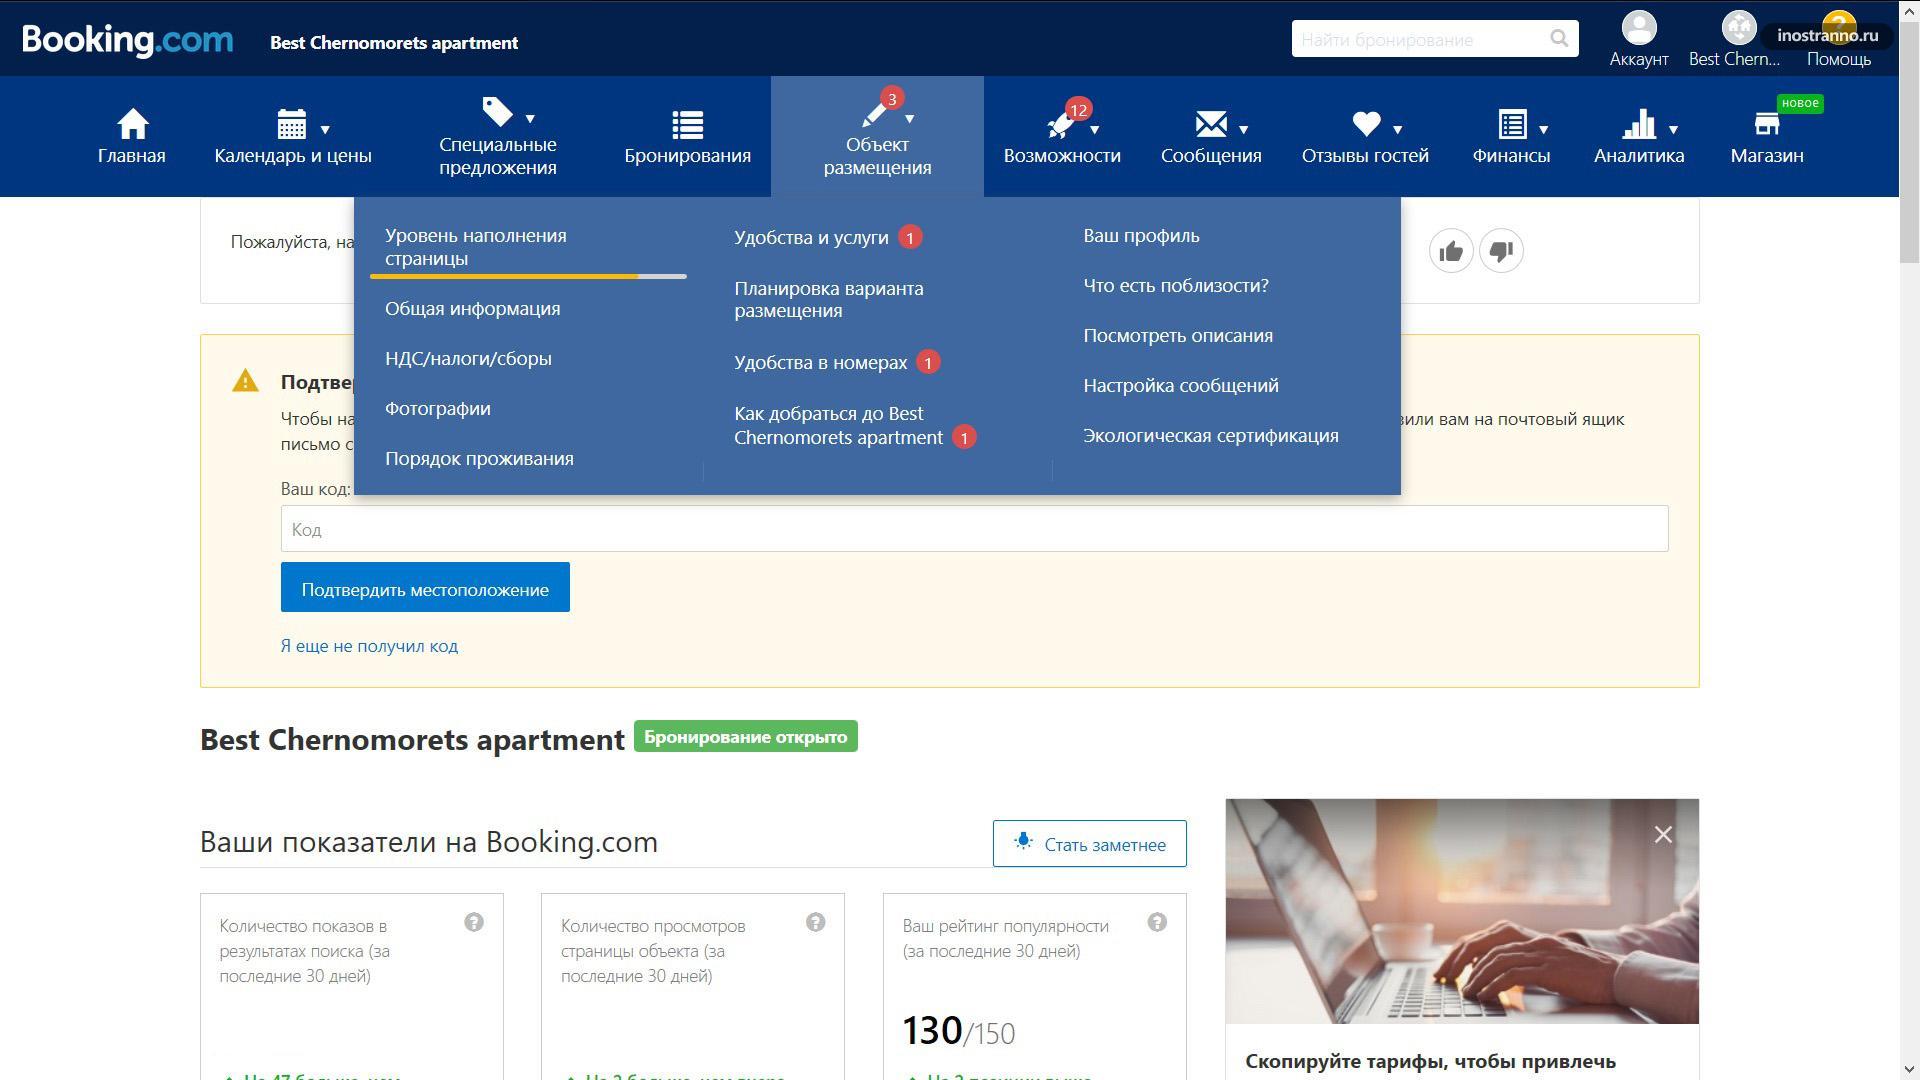 Админка арендодателя на сайте Booking.com